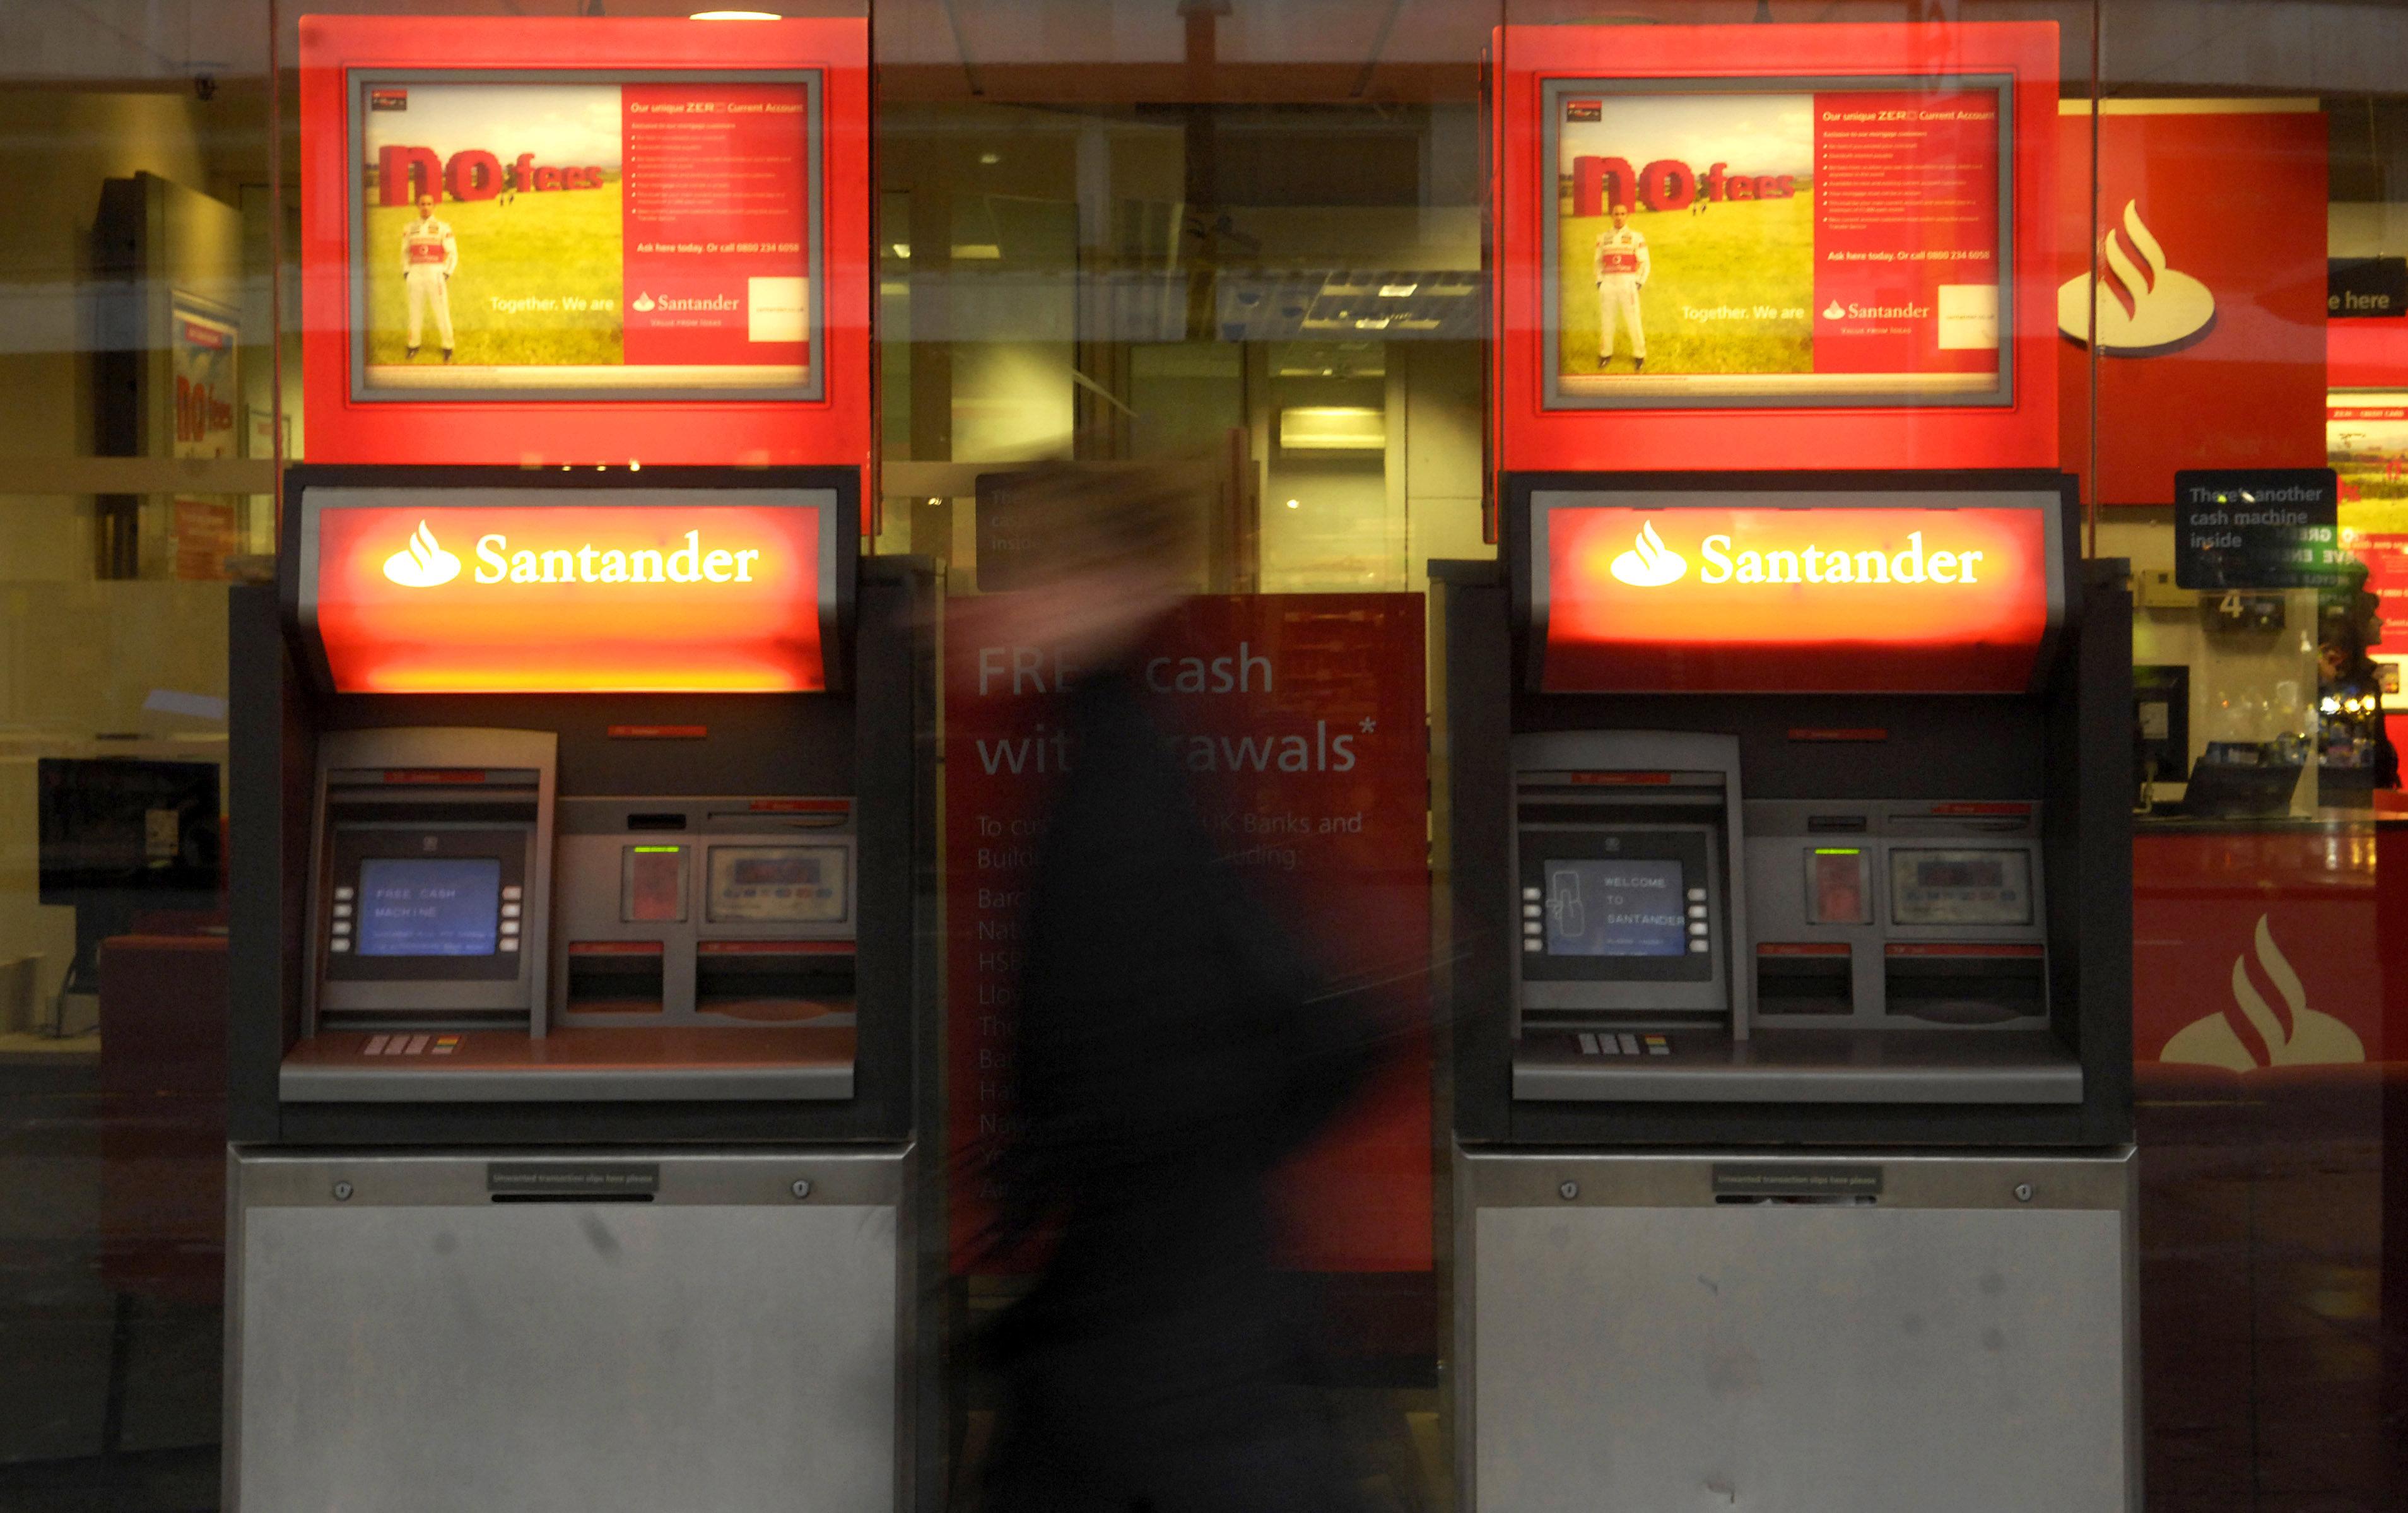 Police Warning Over Santander ATMs 'Compromised' By Criminals